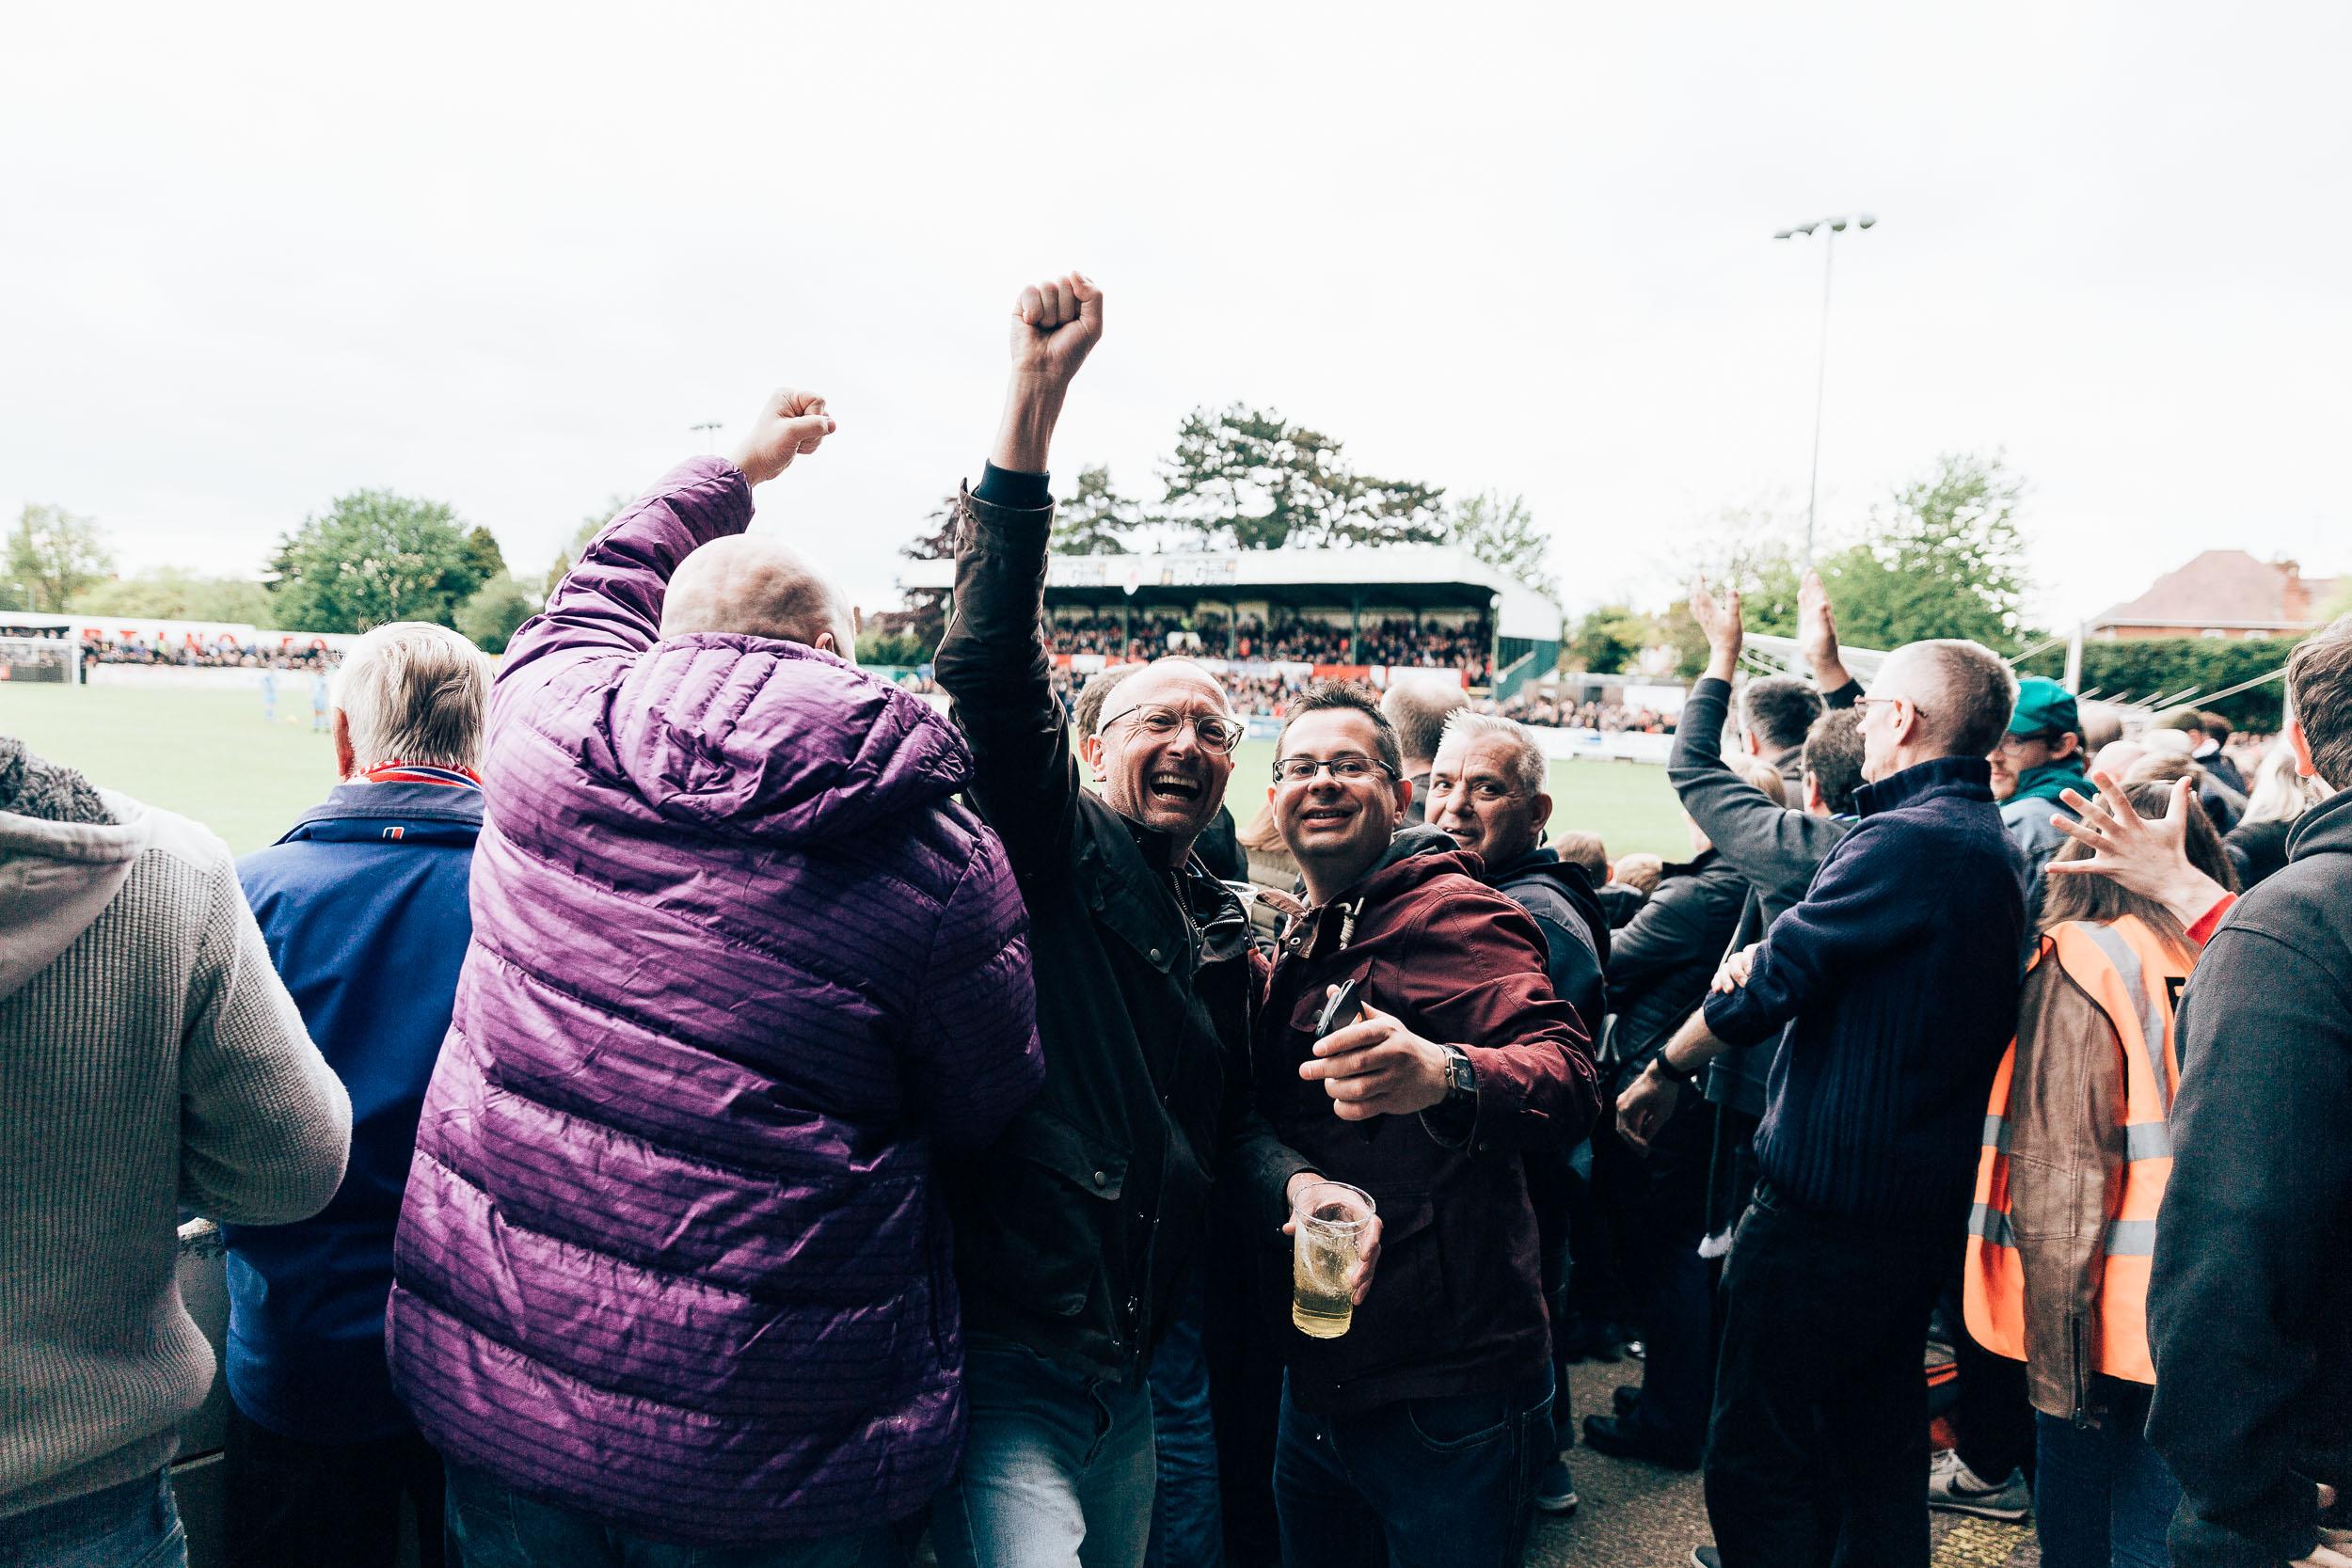 06_05_2019_Bromsgrove_Sporting_Corby-123.jpg